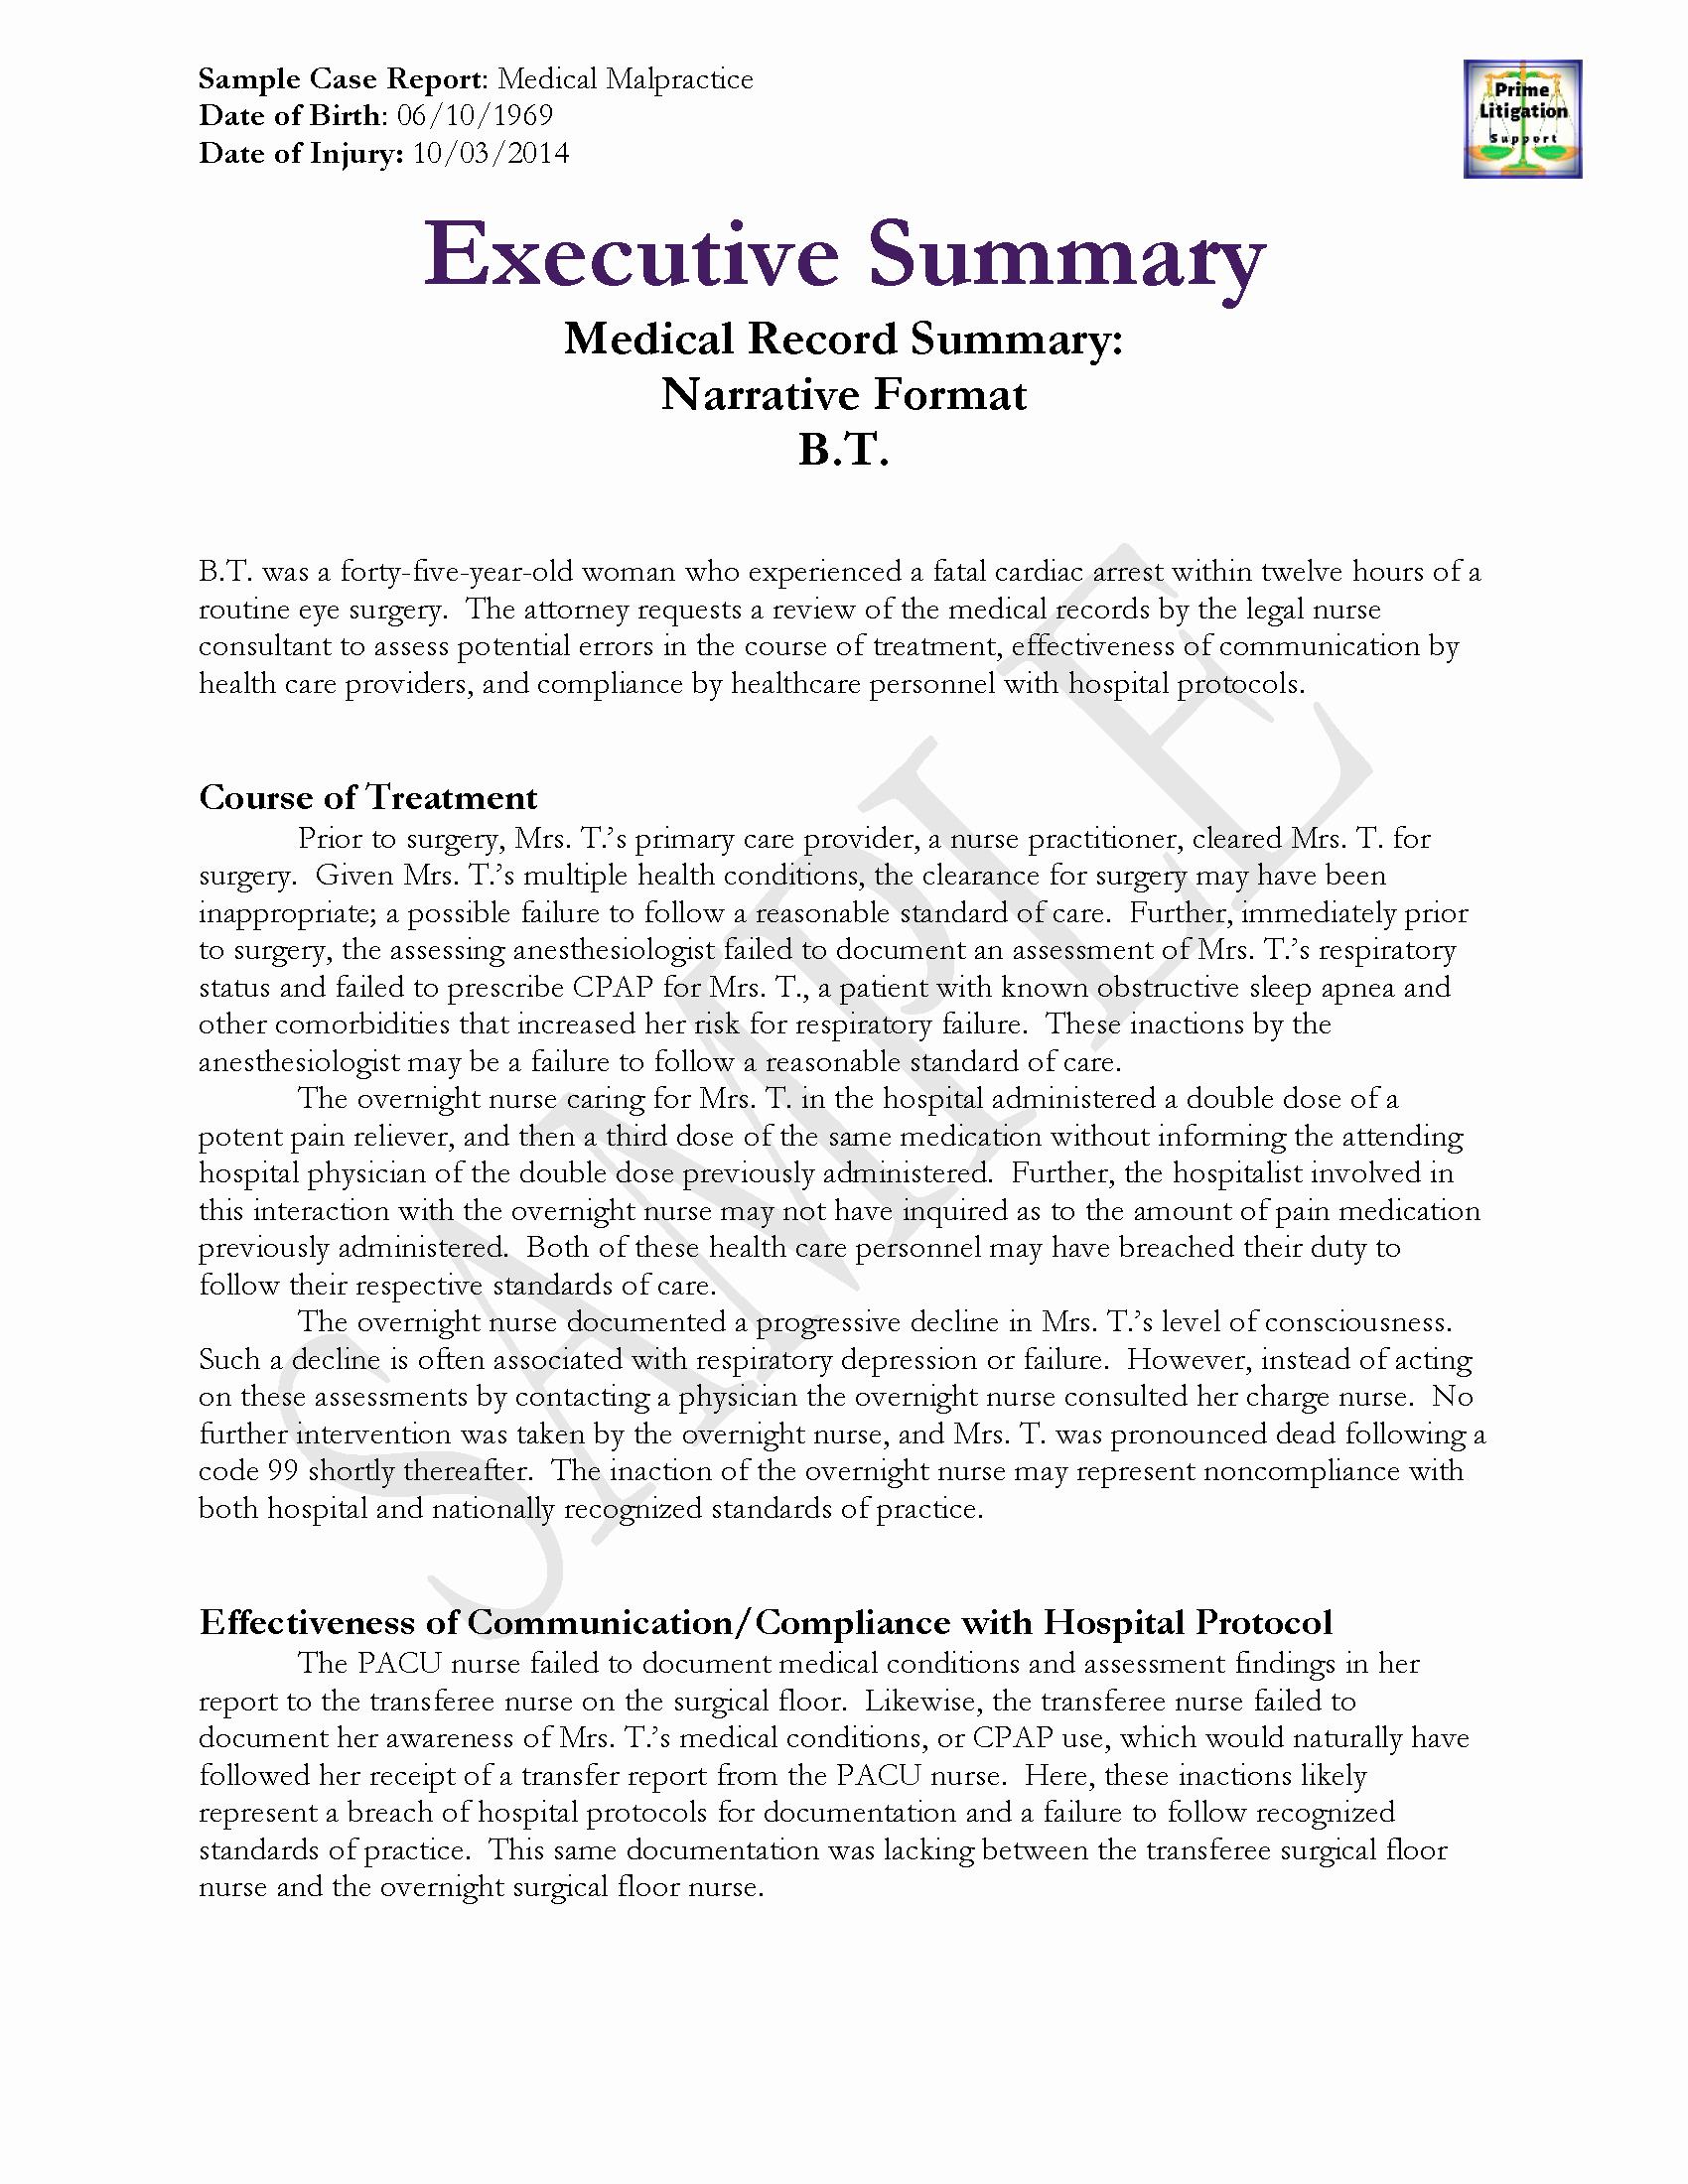 Medical Records Summary Template Elegant Legal Nurse Consultant Samples Prime Litigation Support